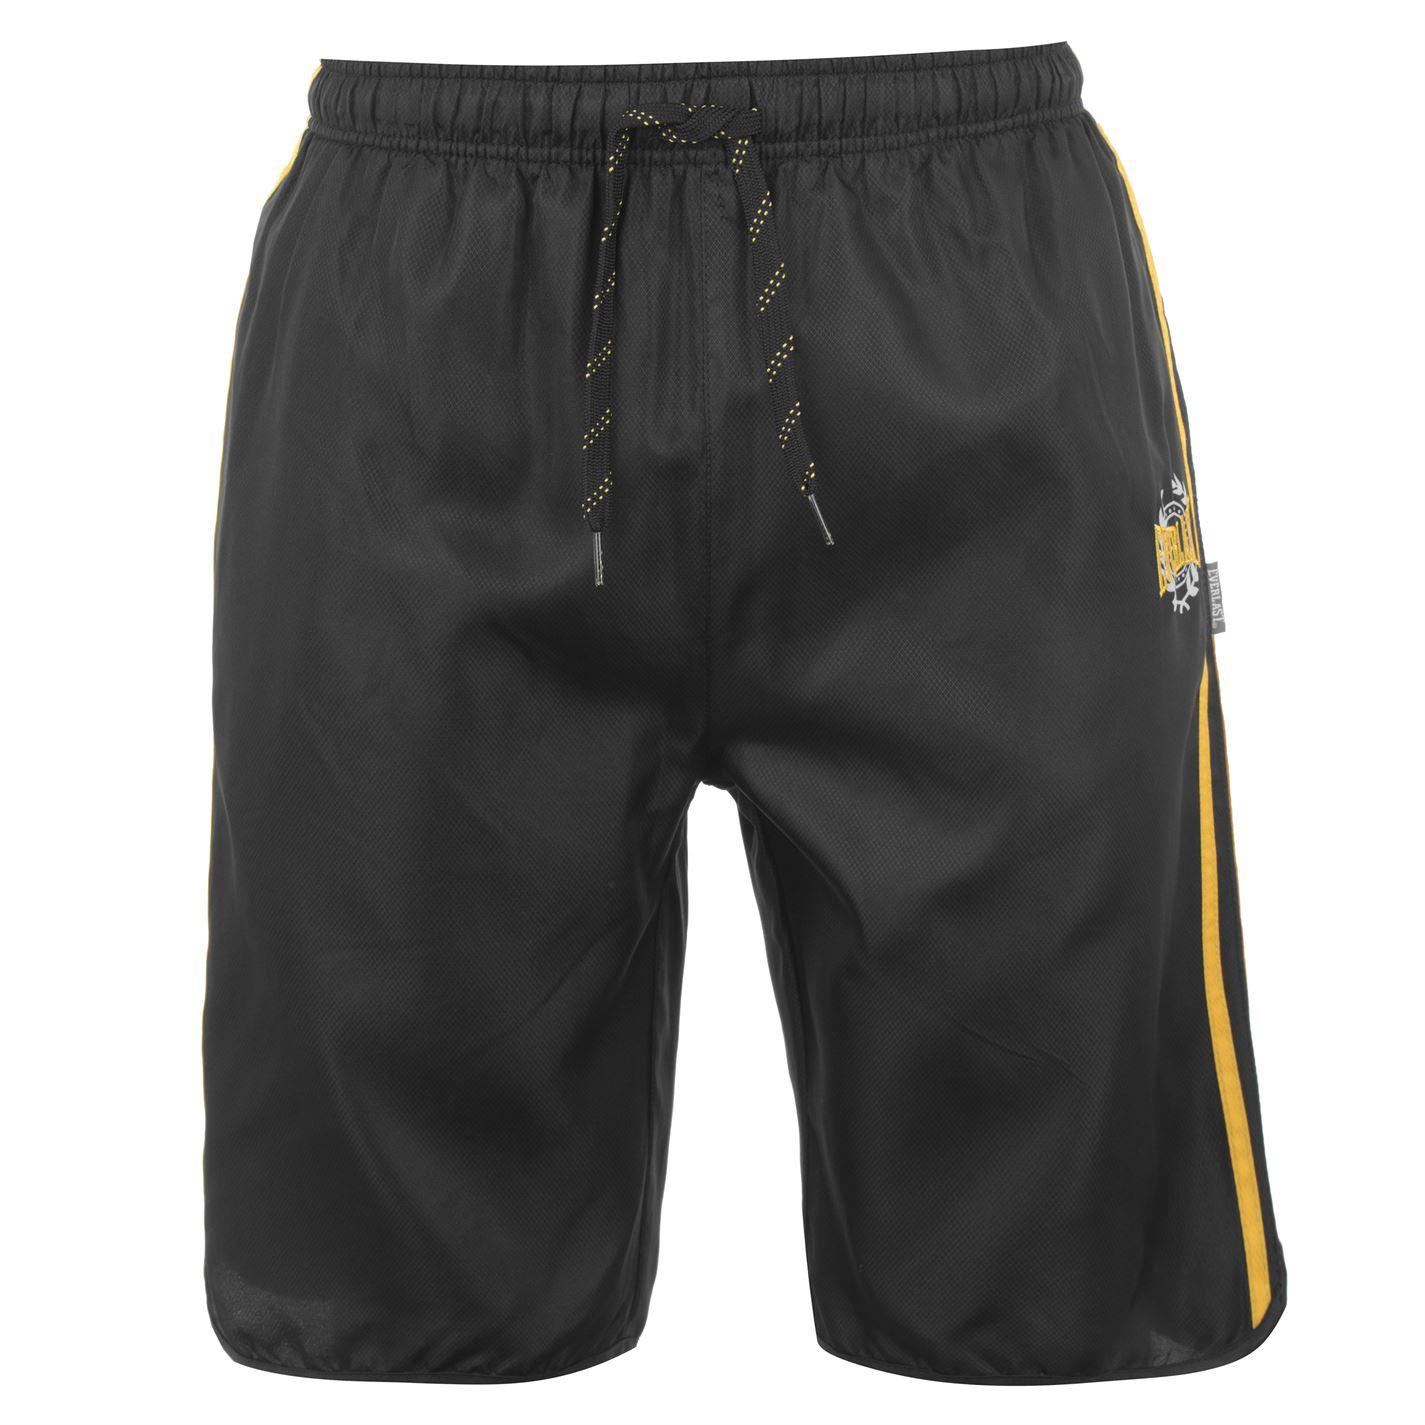 Everlast Woven Logo Shorts Mens